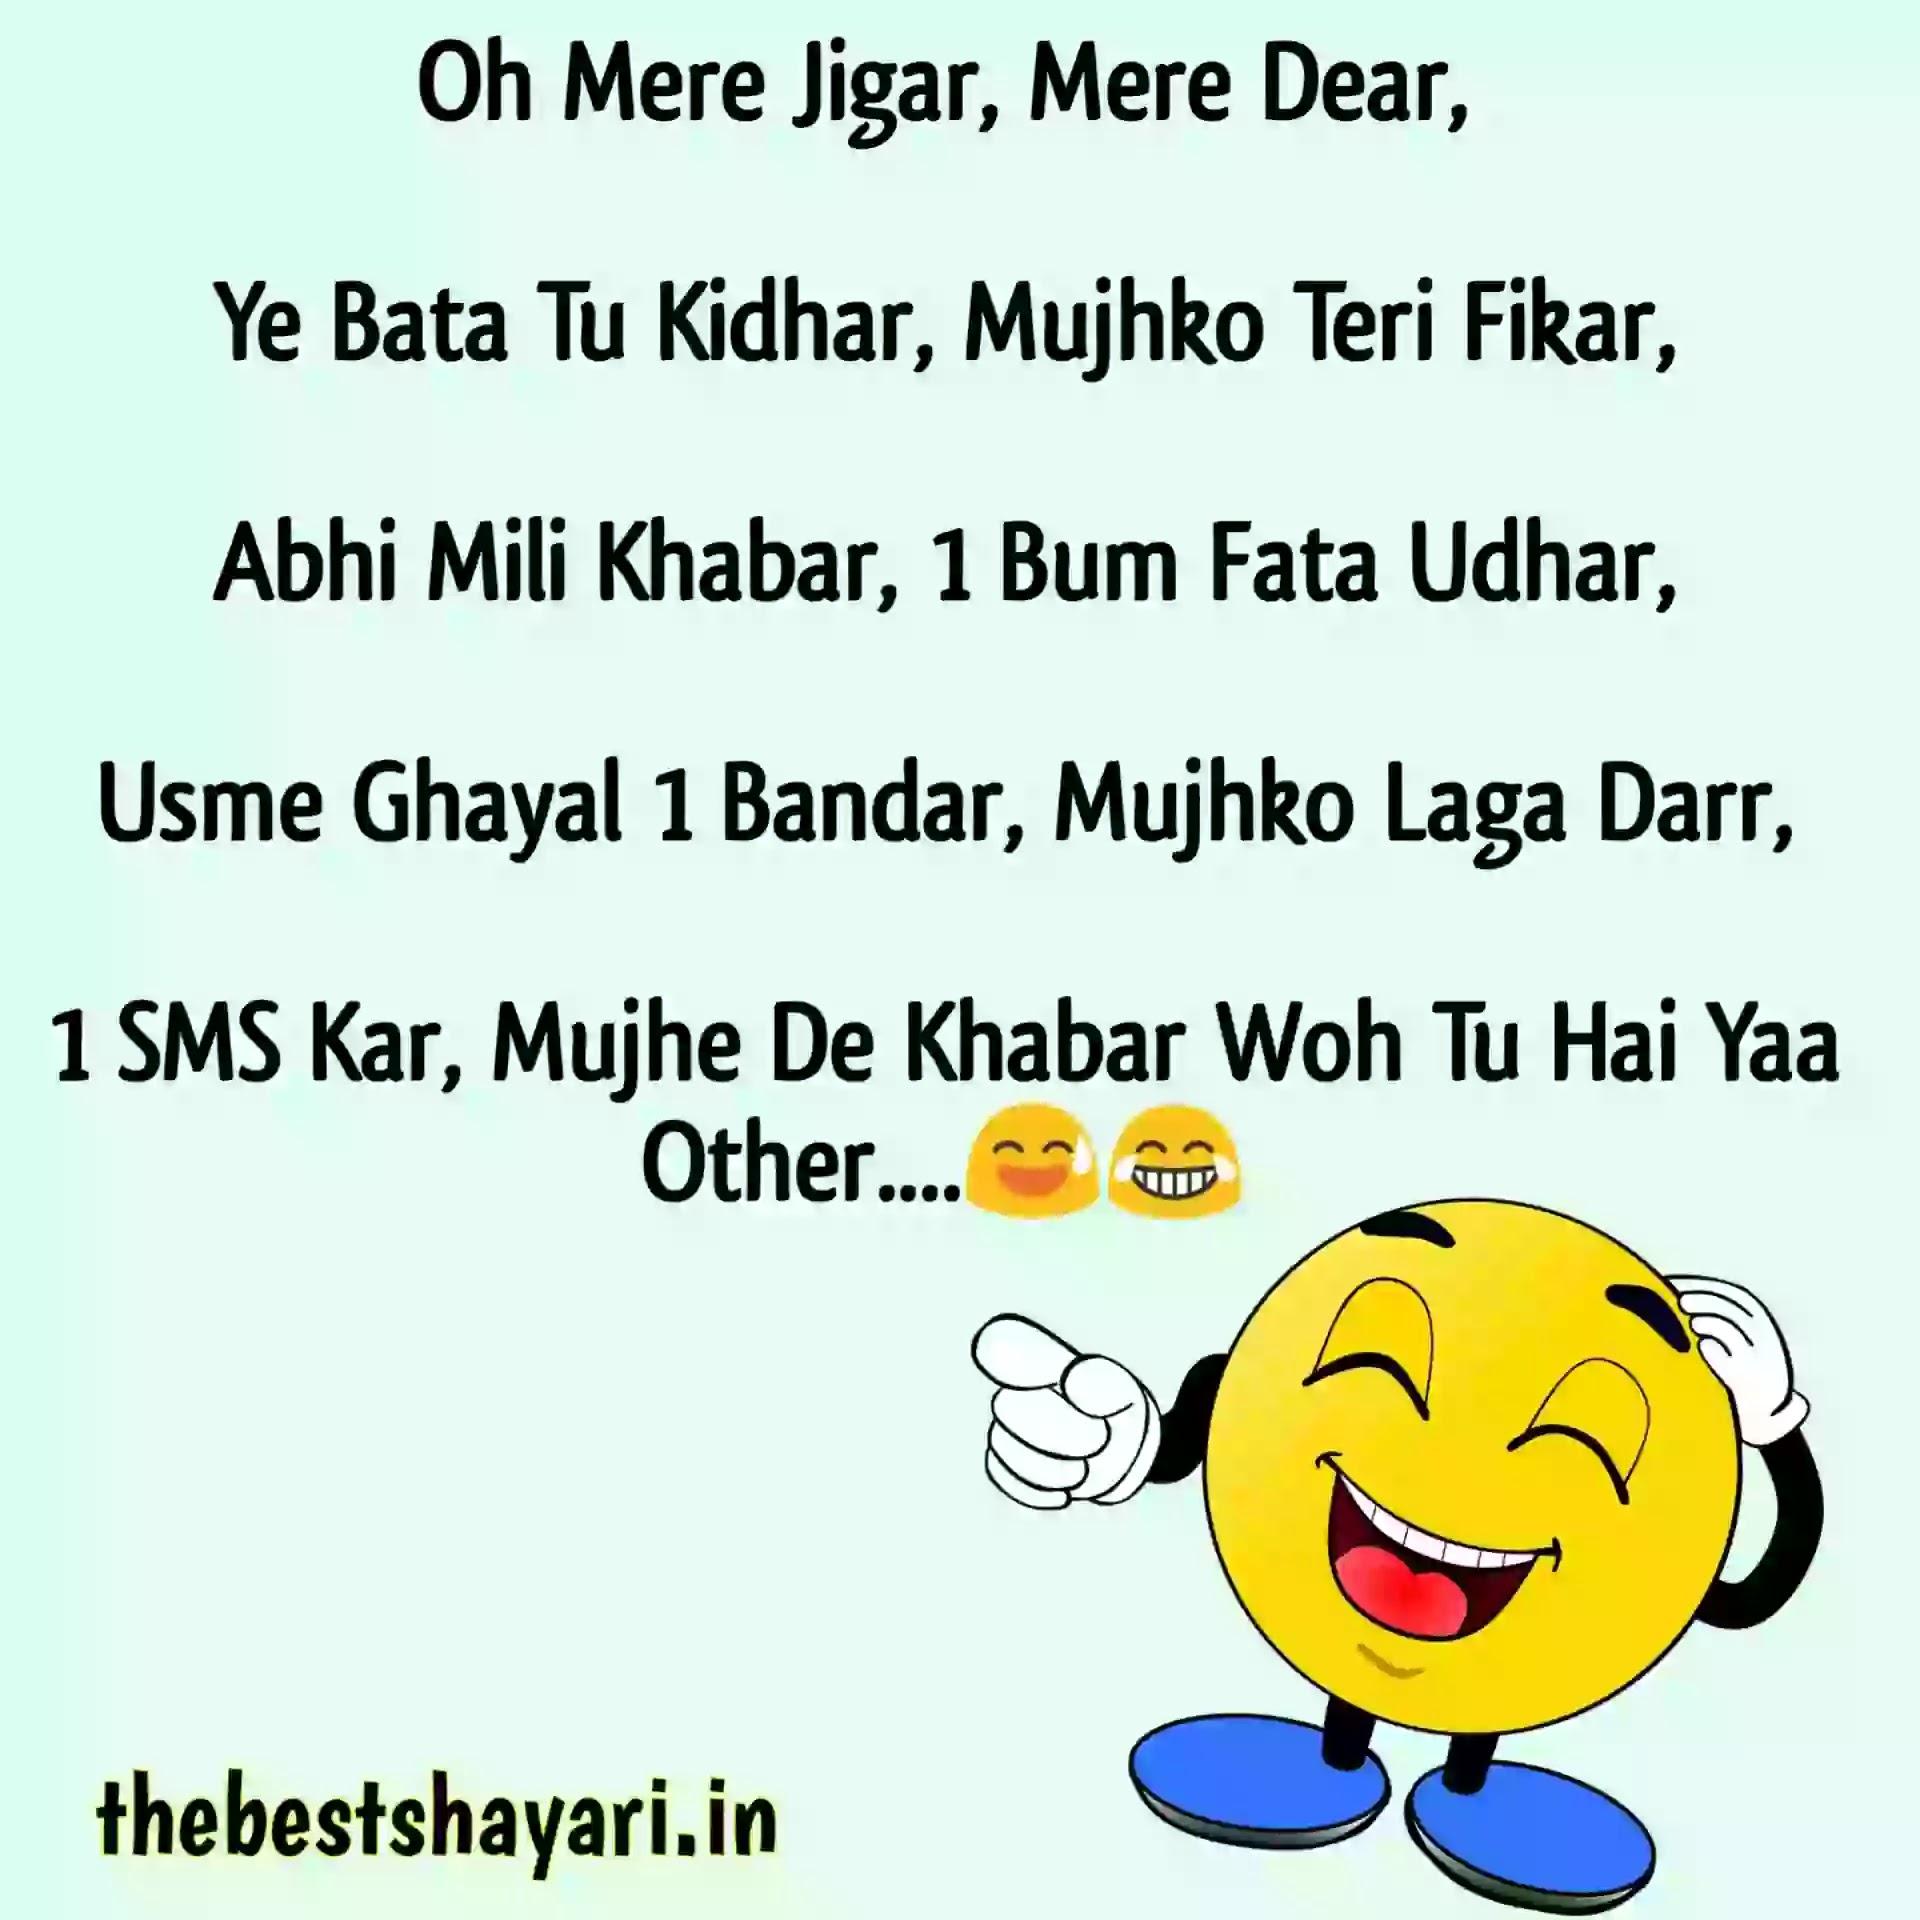 Funny shayari in dost in Hindi and English